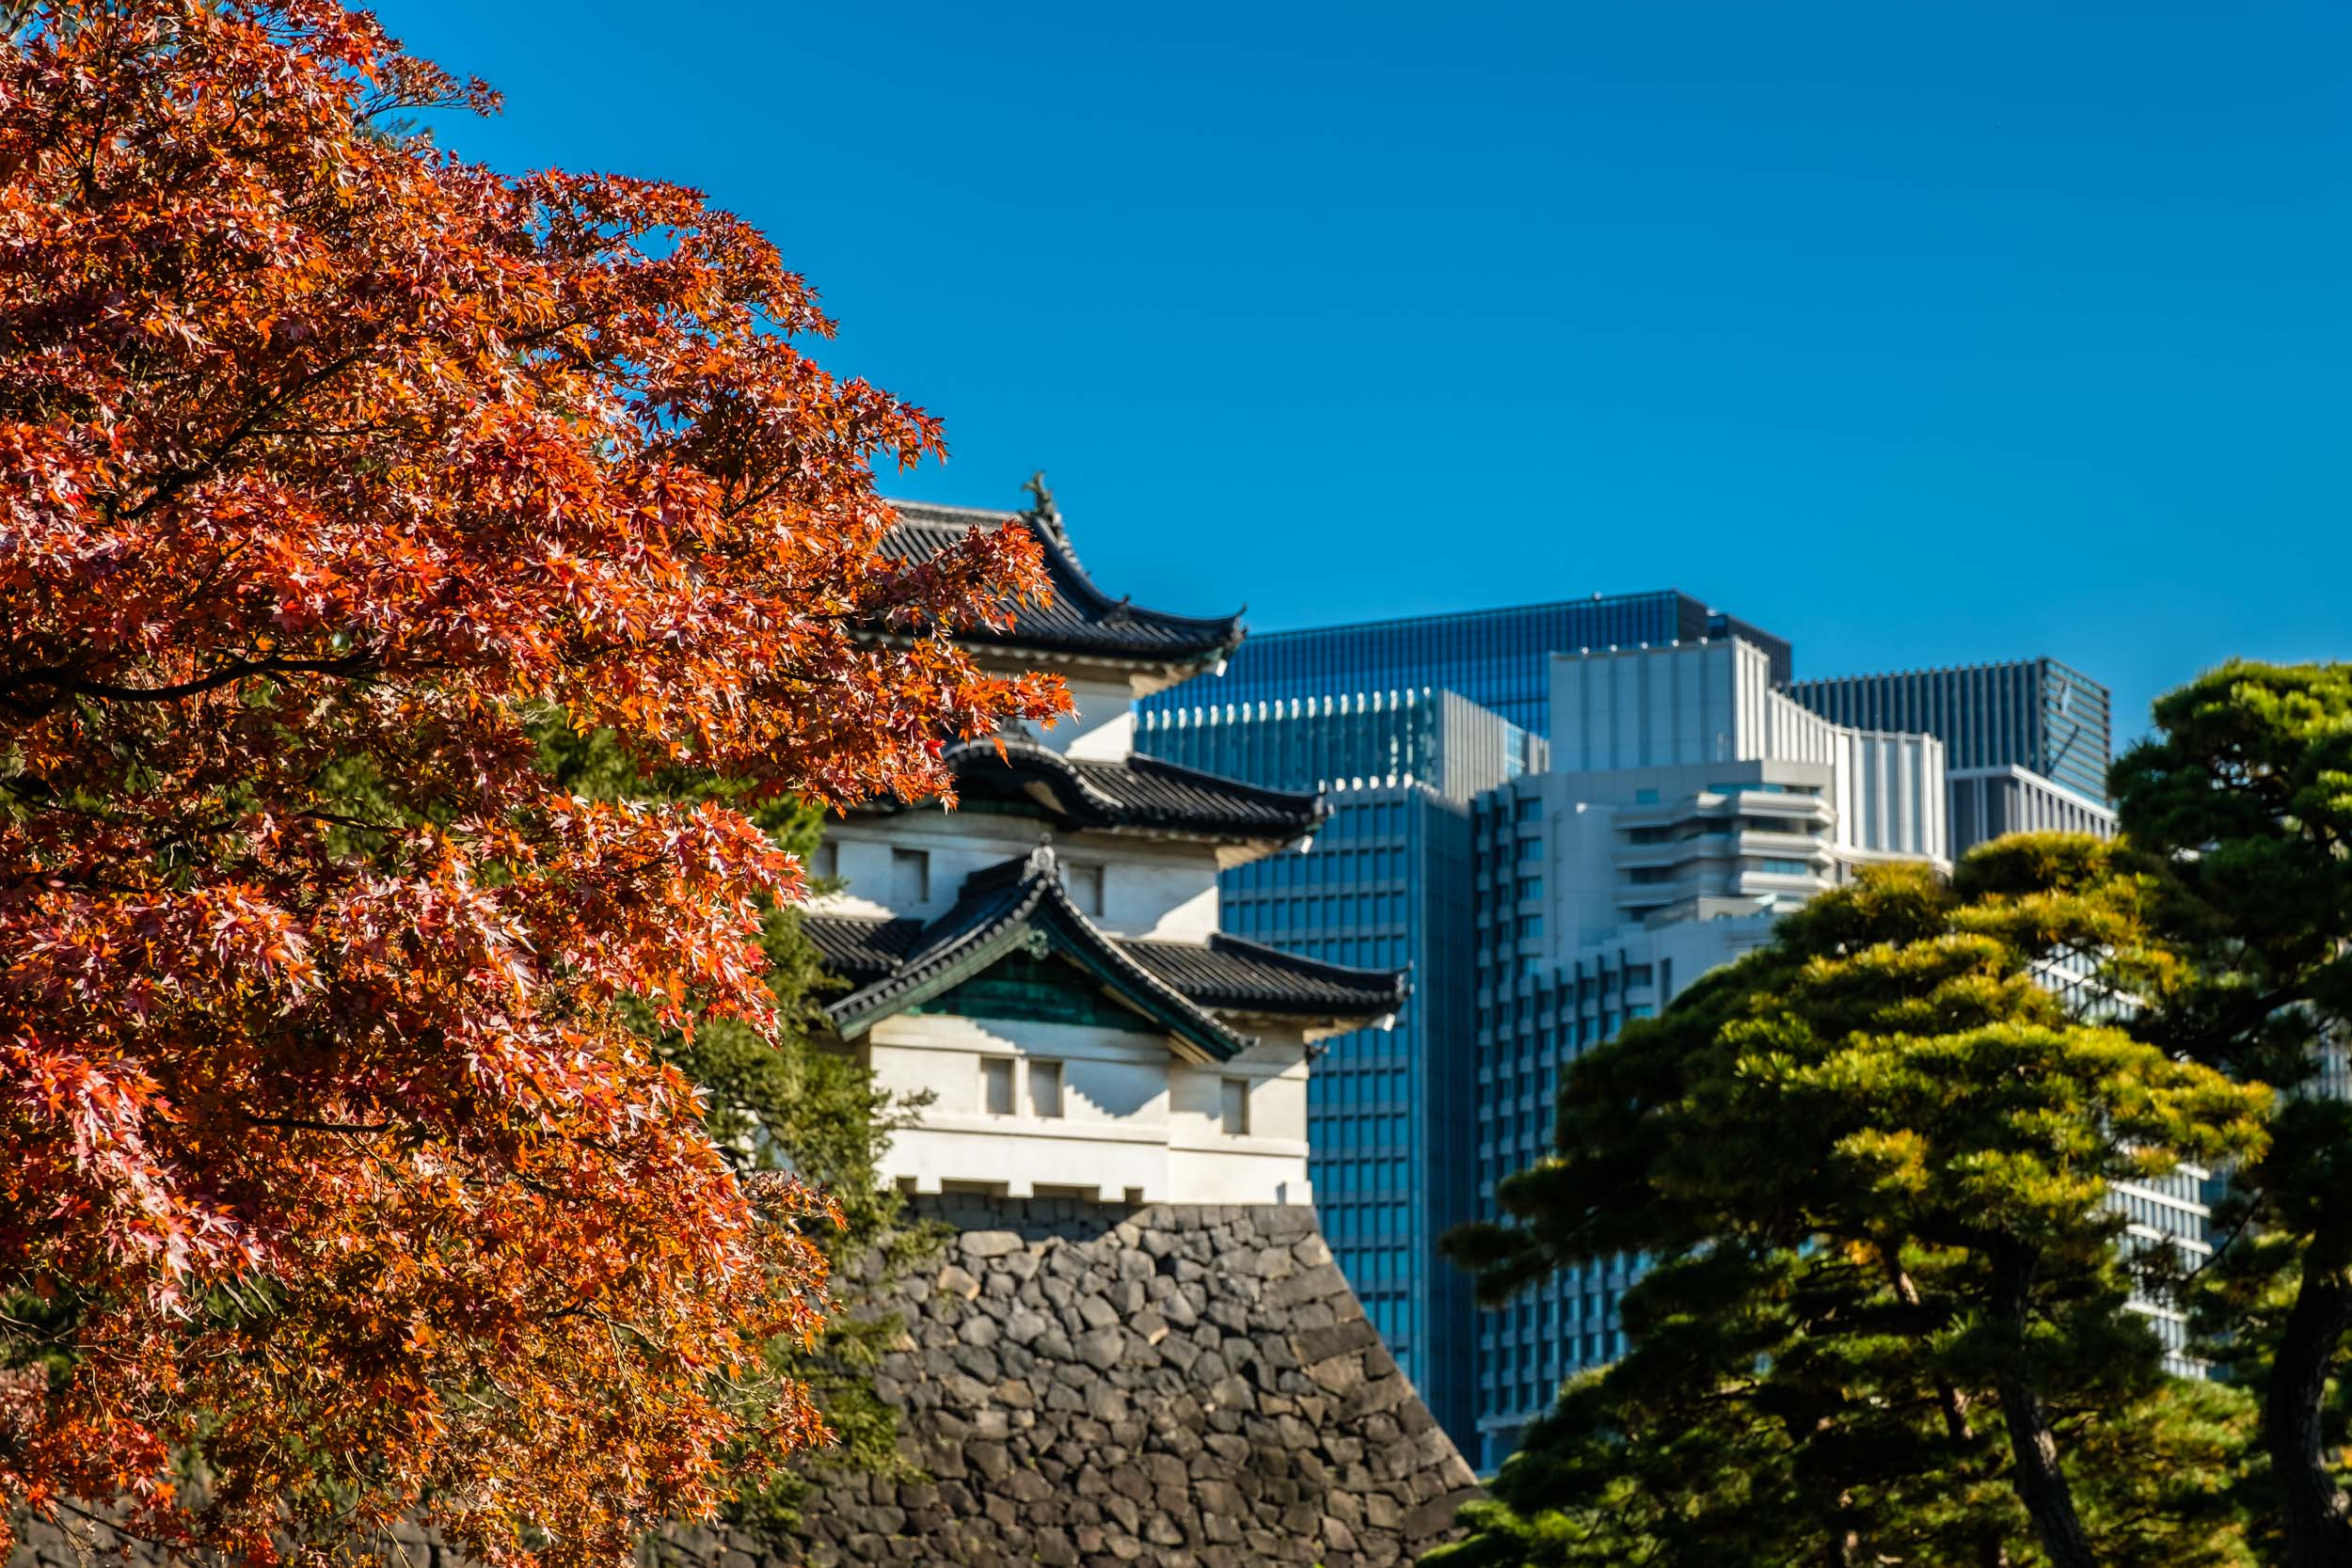 Fujimi keep and the Marunouchi beyond